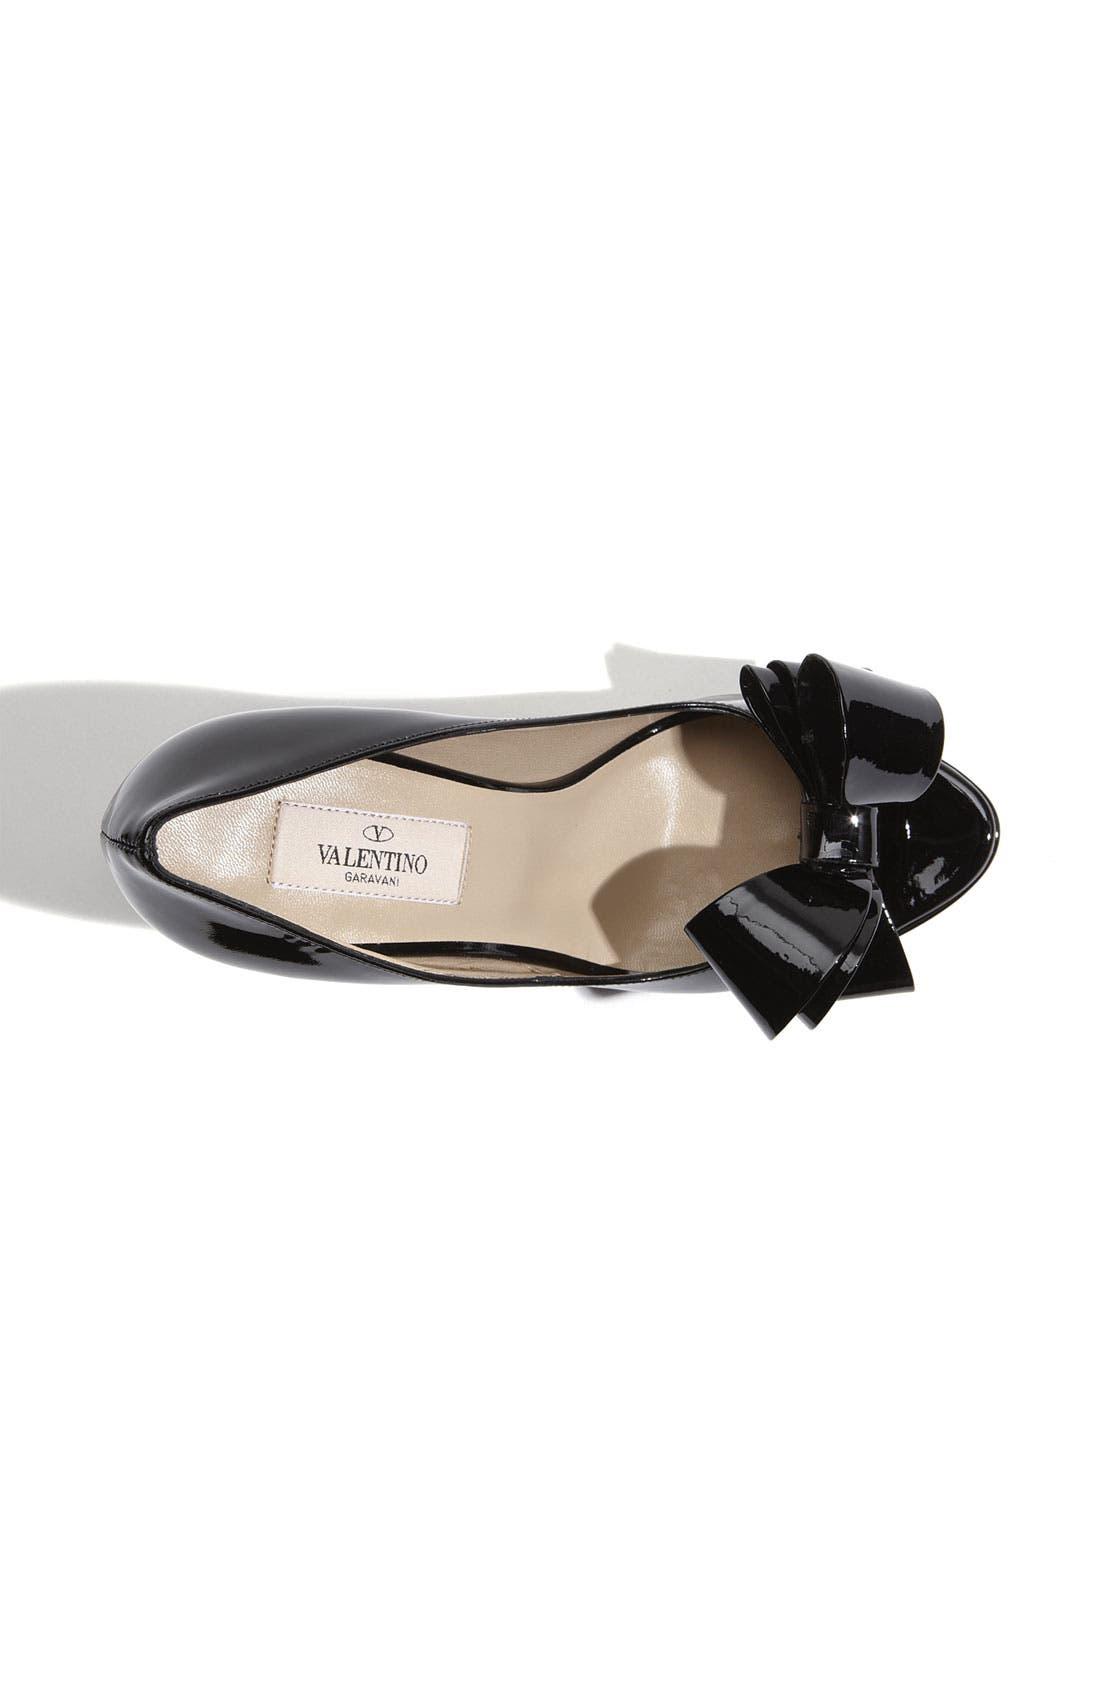 VALENTINO GARAVANI,                             Couture Bow Platform Pump,                             Alternate thumbnail 4, color,                             001